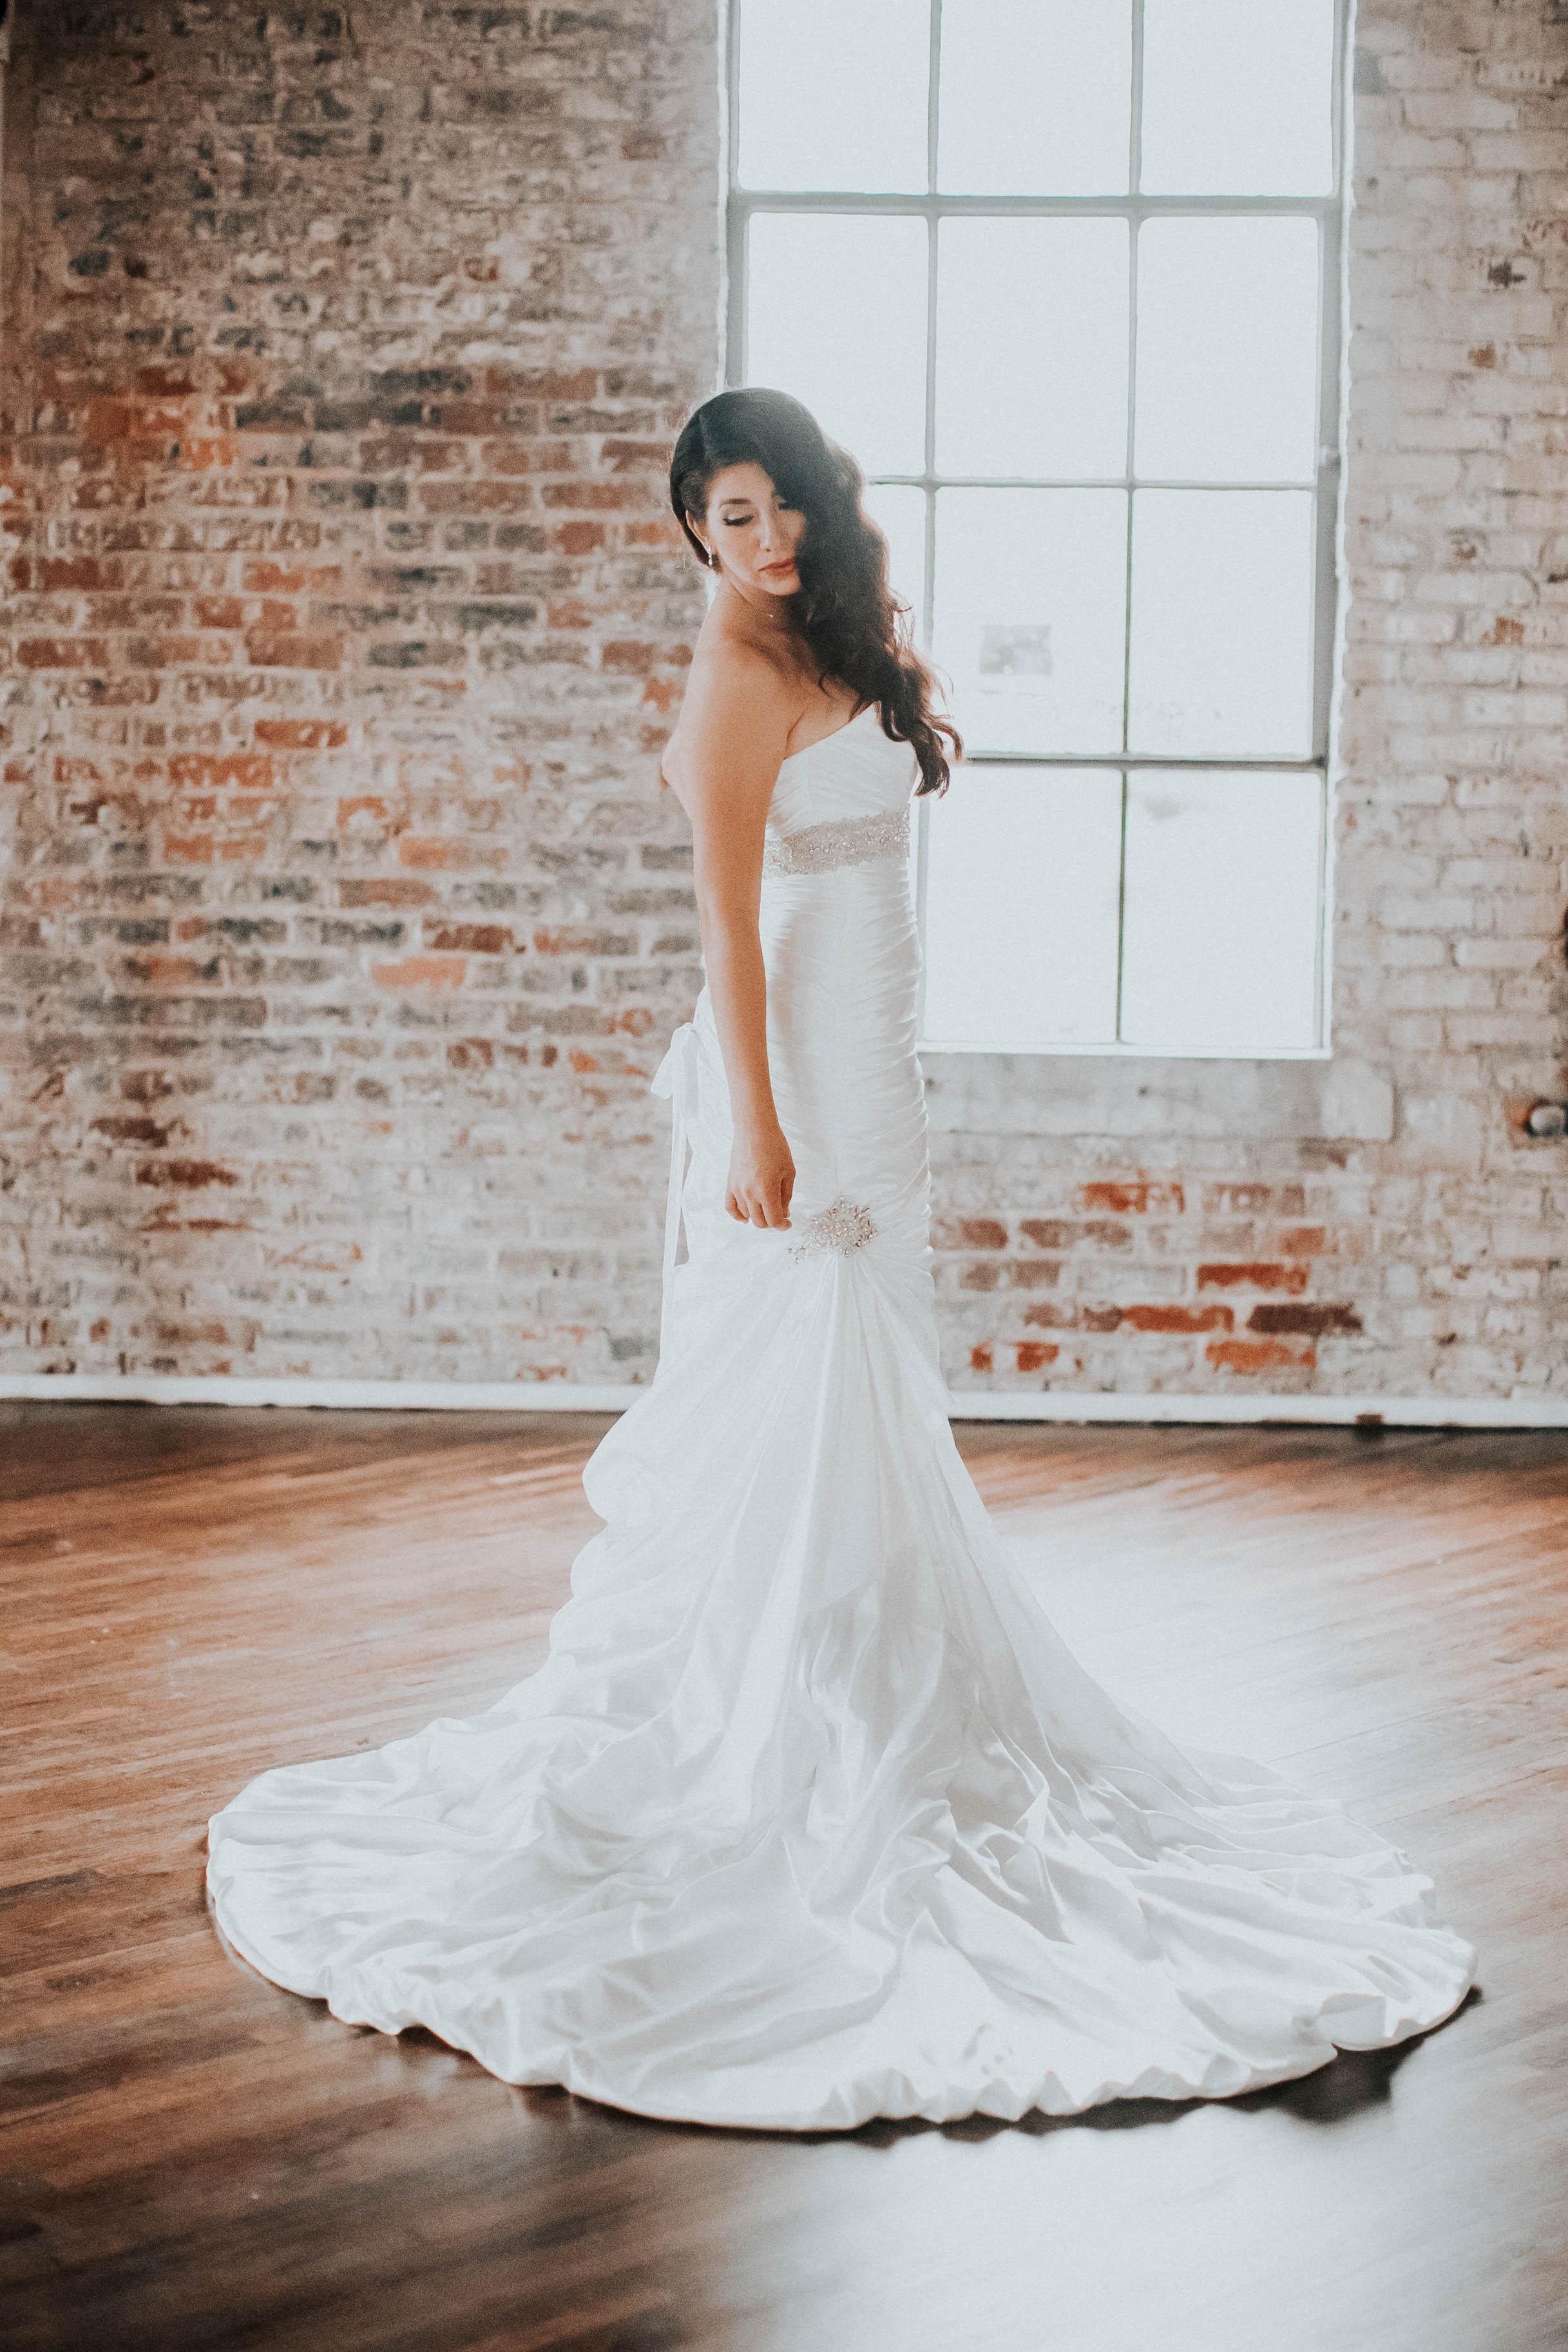 Houston Texas Engagment and Wedding Photographer-0258.jpg